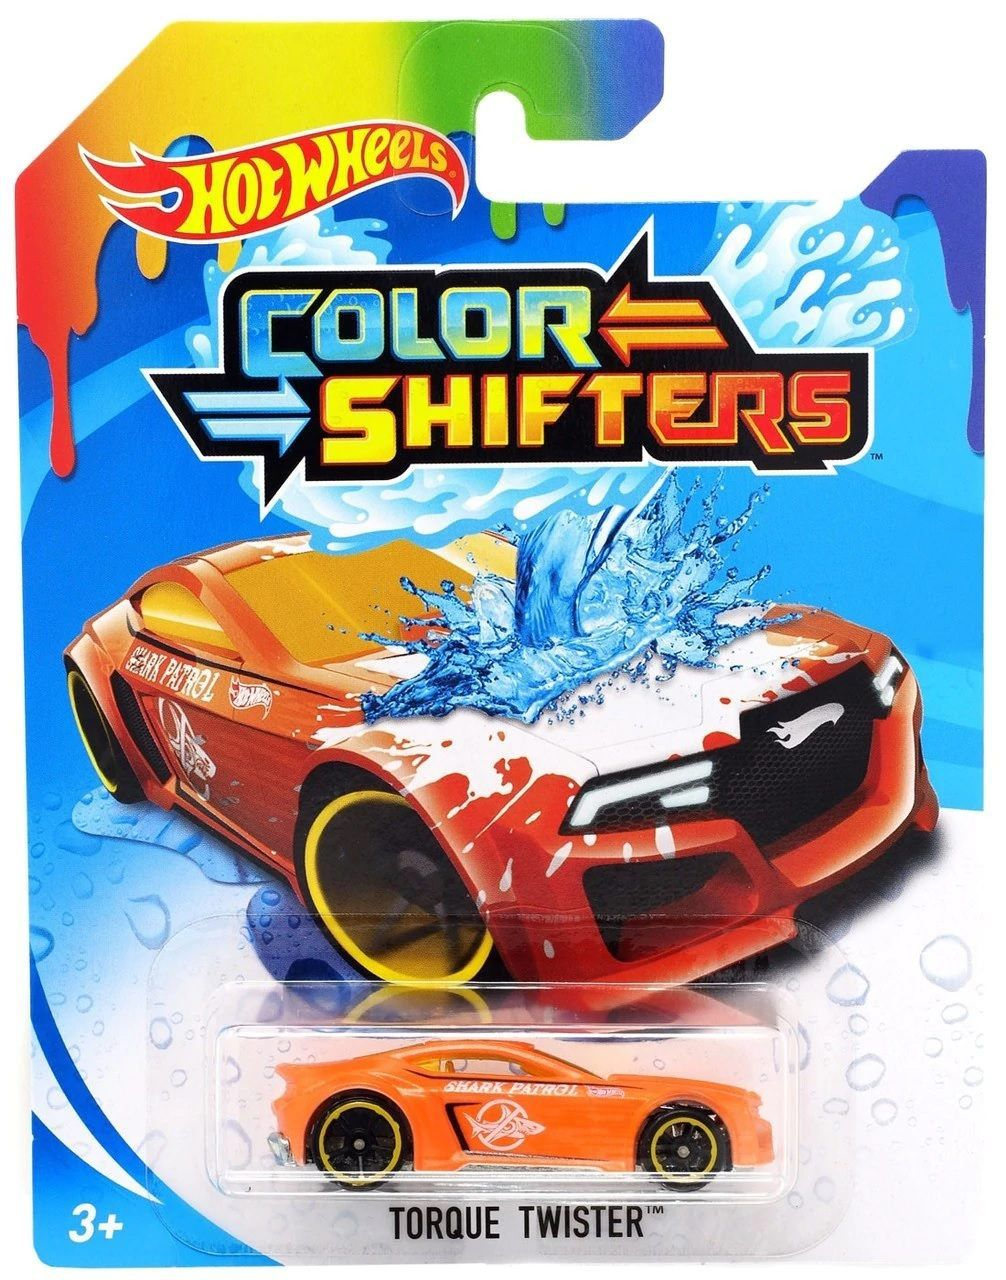 Carrinho Hot Wheels Colour Shifters: Torque Twister - Mattel